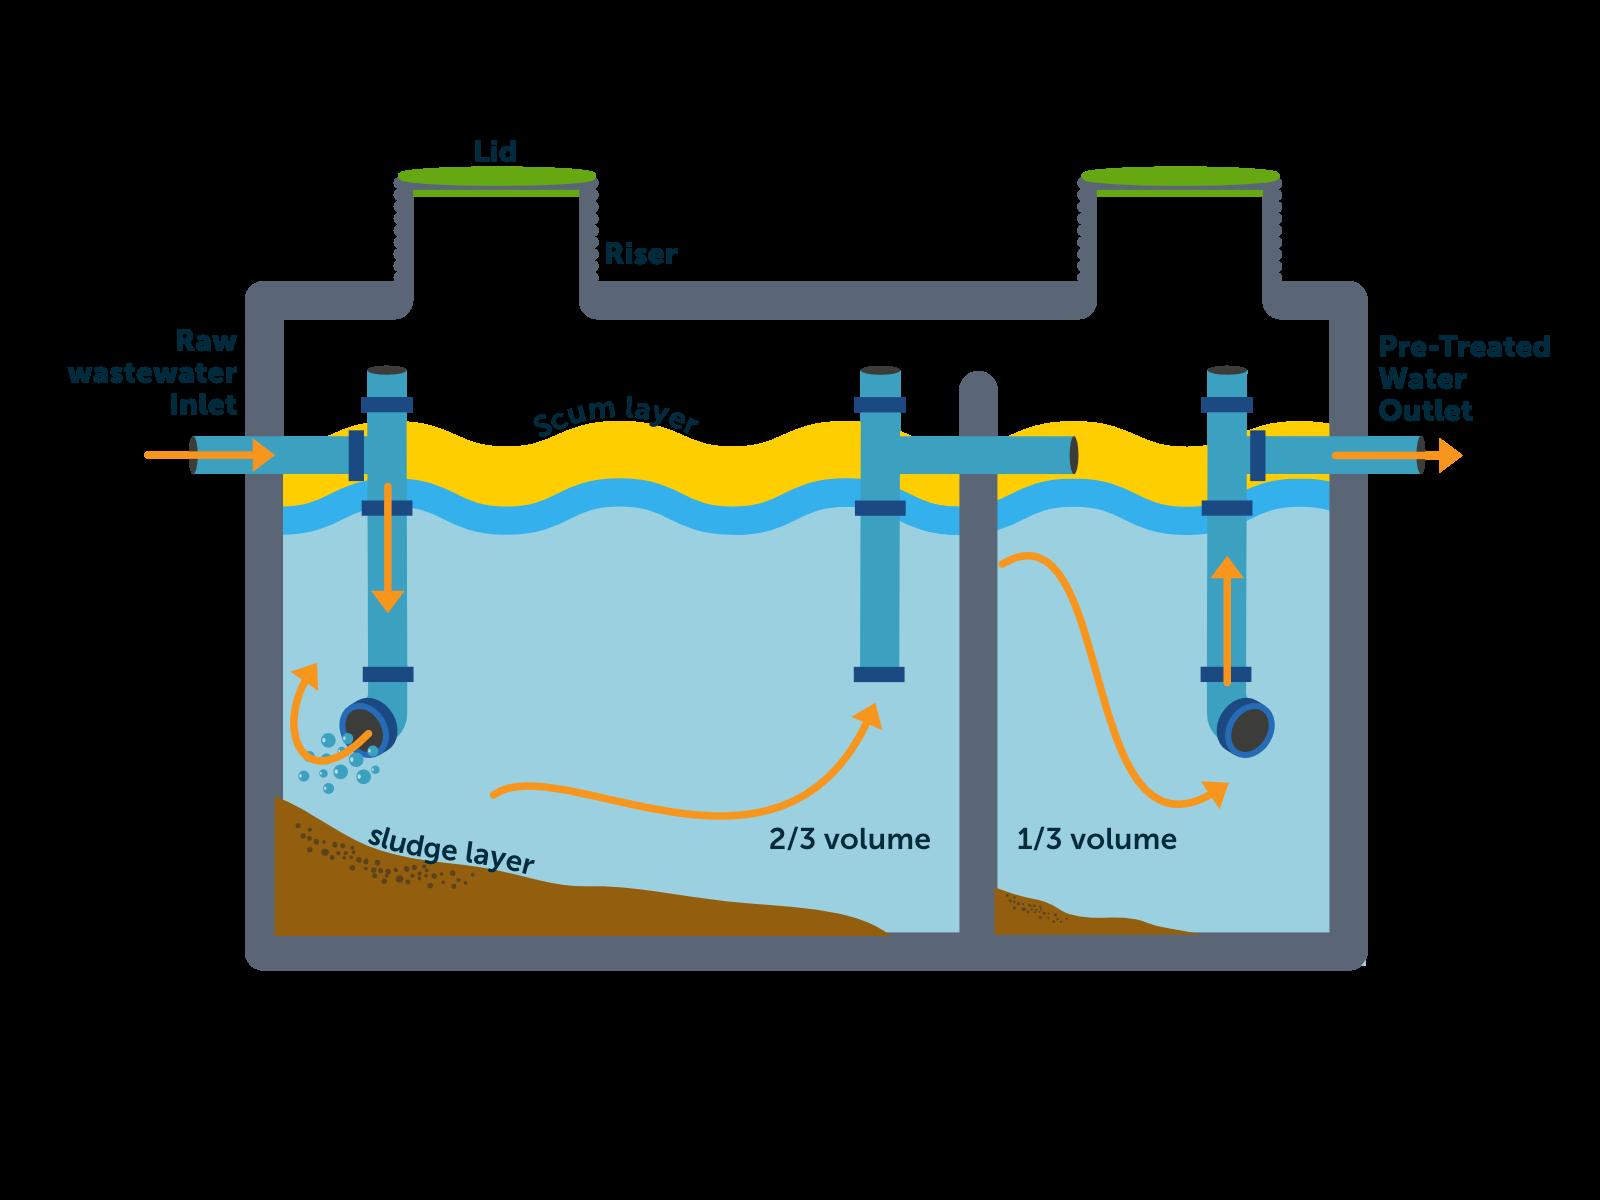 Primary tank diagram